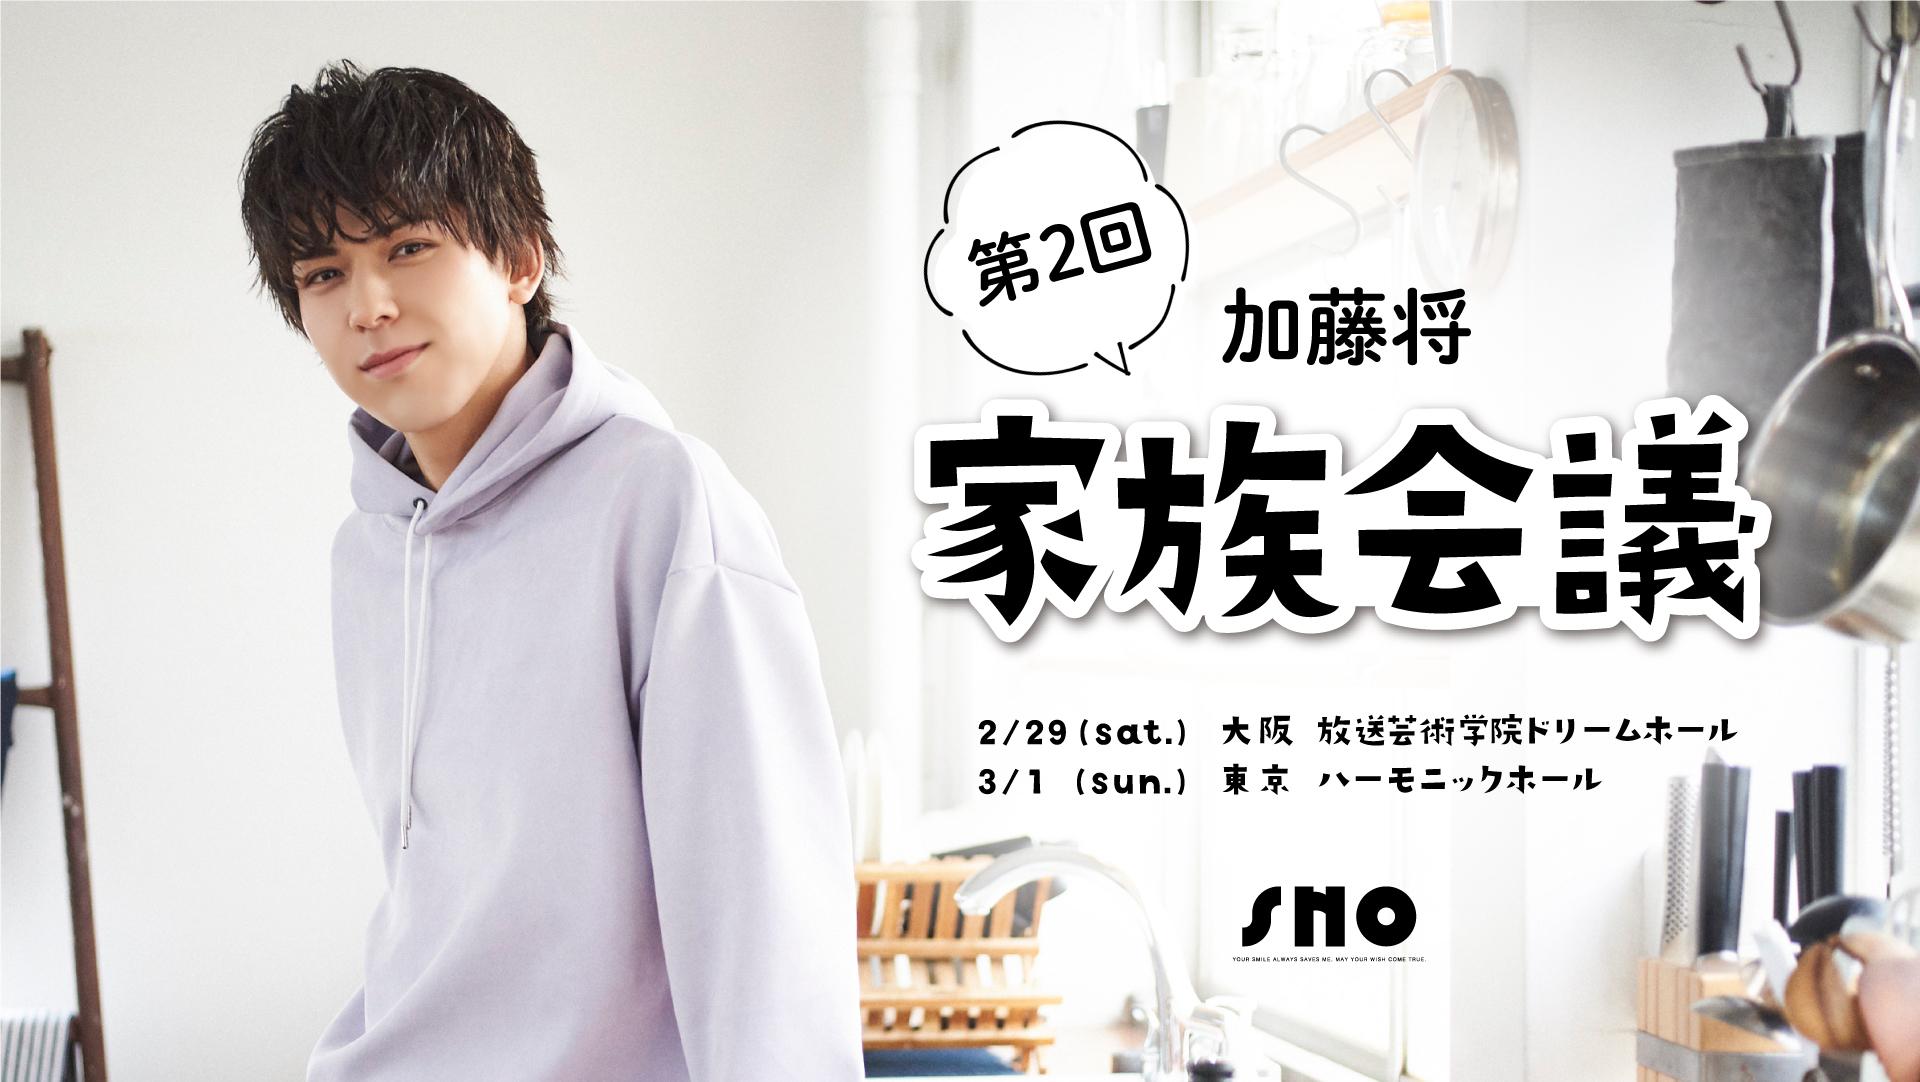 Kato_202003_header_0116